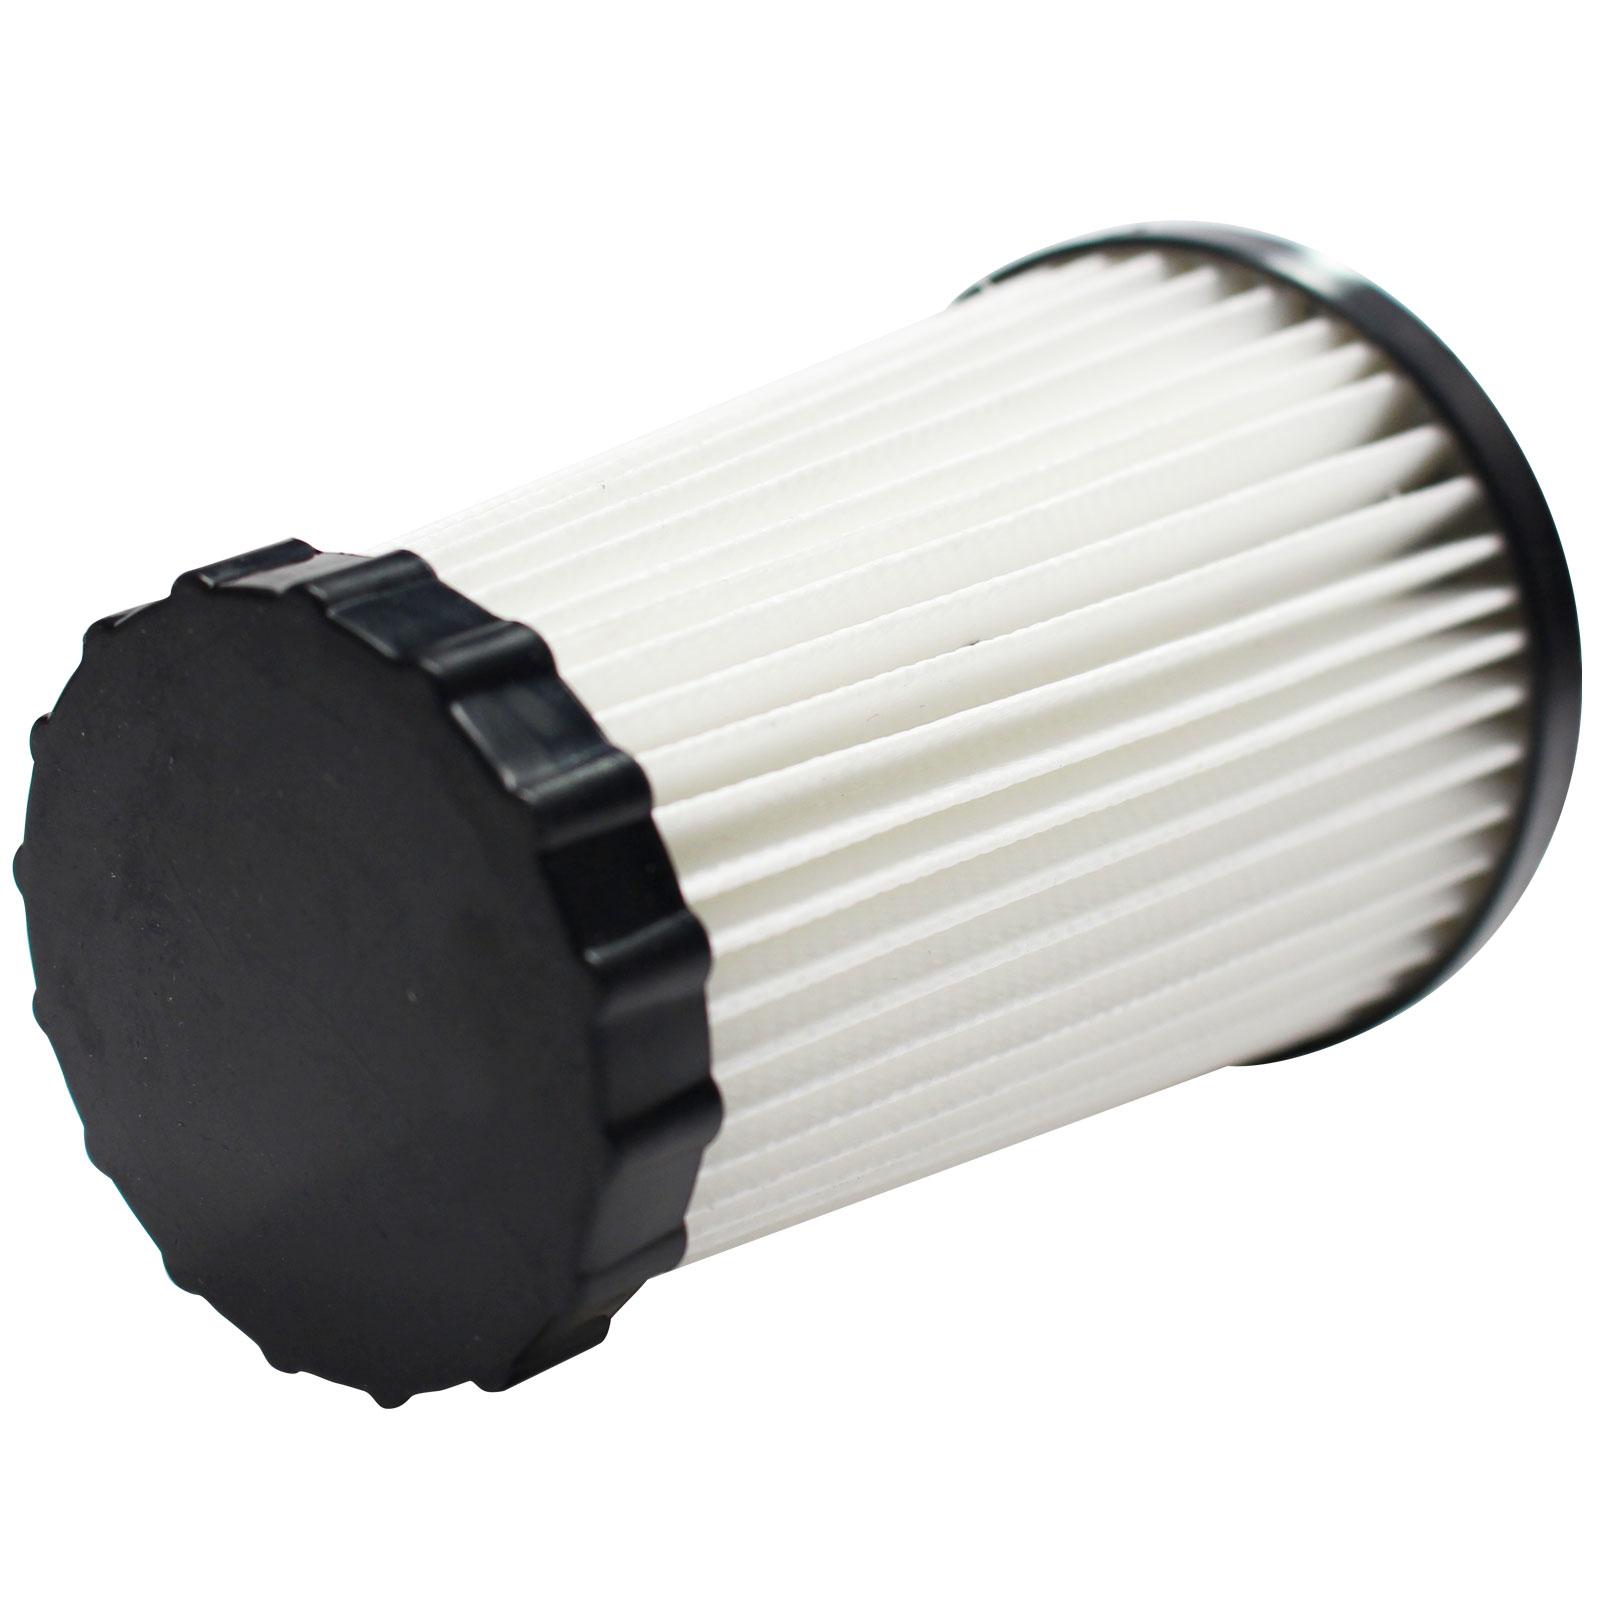 8x Vacuum Filter for Dirt Devil Power Reach Hand Vac M08245X,UD40240 w// Kit